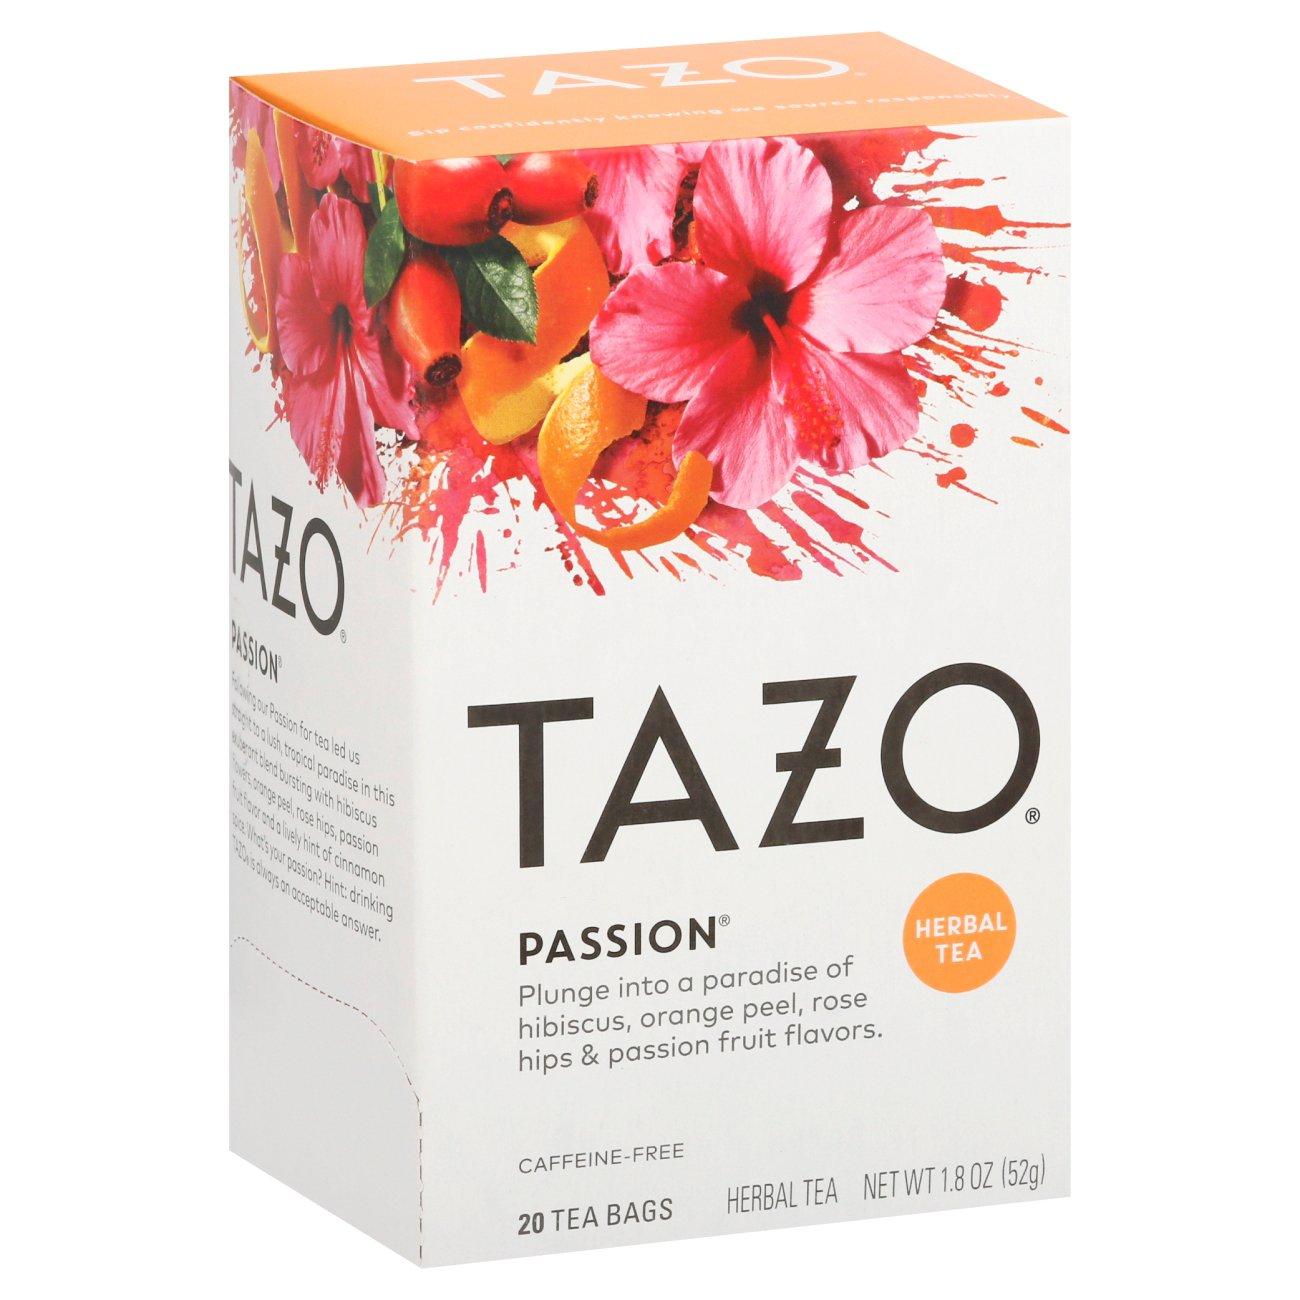 Tazo Passion Herbal Tea Bags - Shop Tea